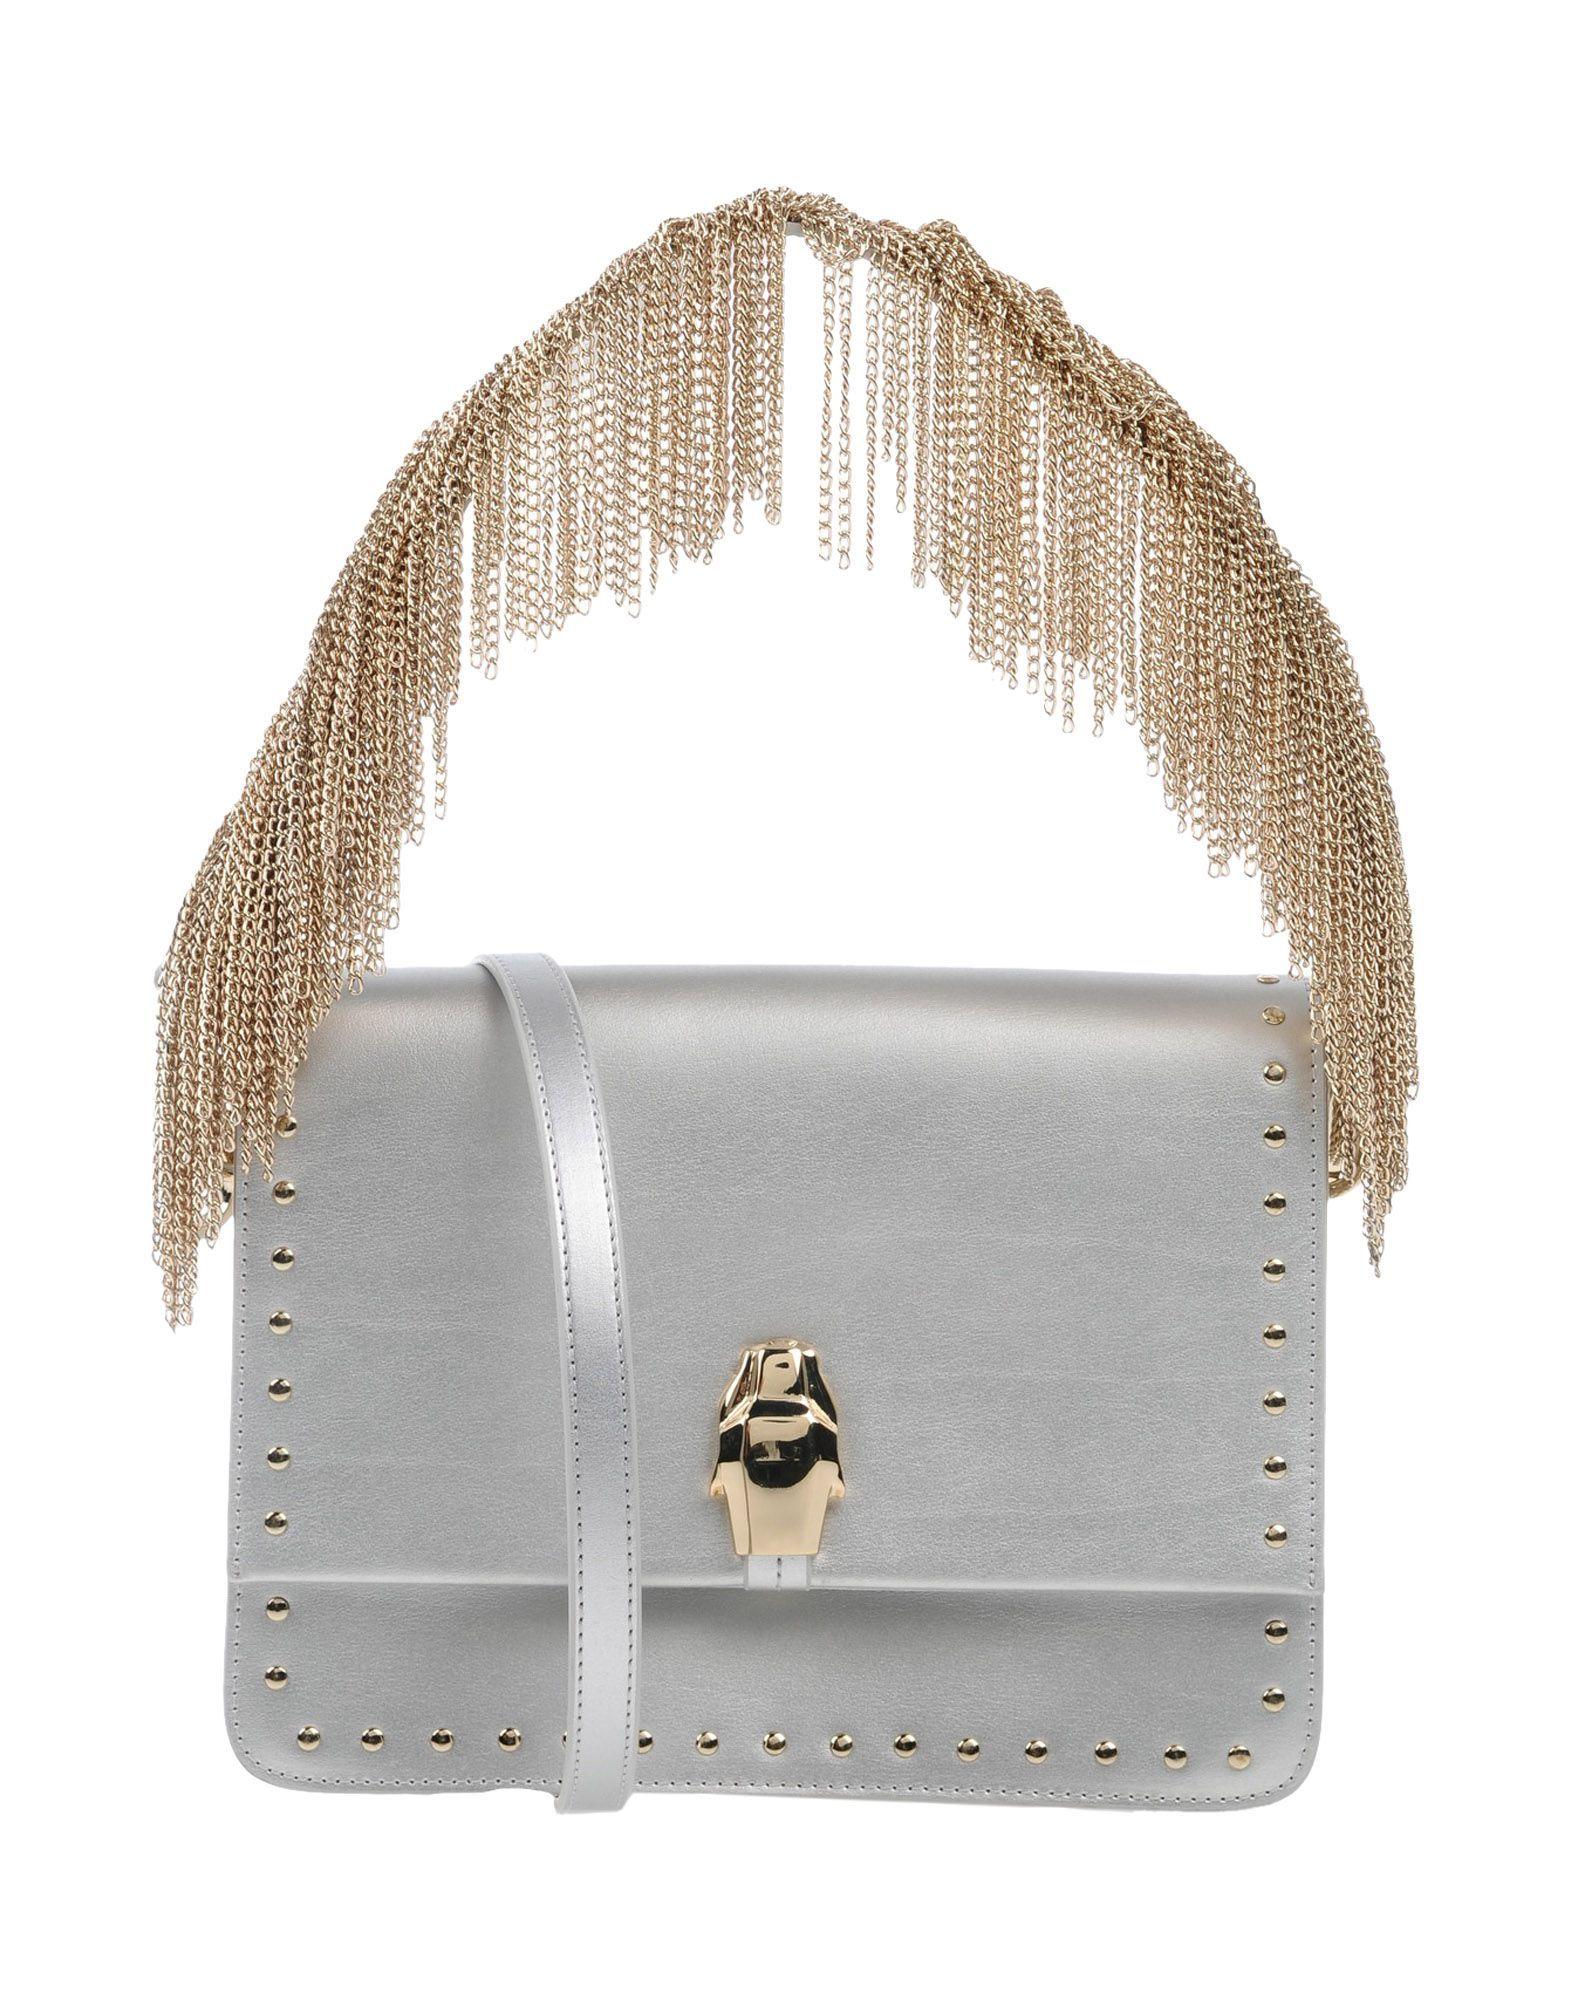 ba05e1b9307e CLASS ROBERTO CAVALLI . #classrobertocavalli #bags #shoulder bags #clutch  #pvc #leather #hand bags #